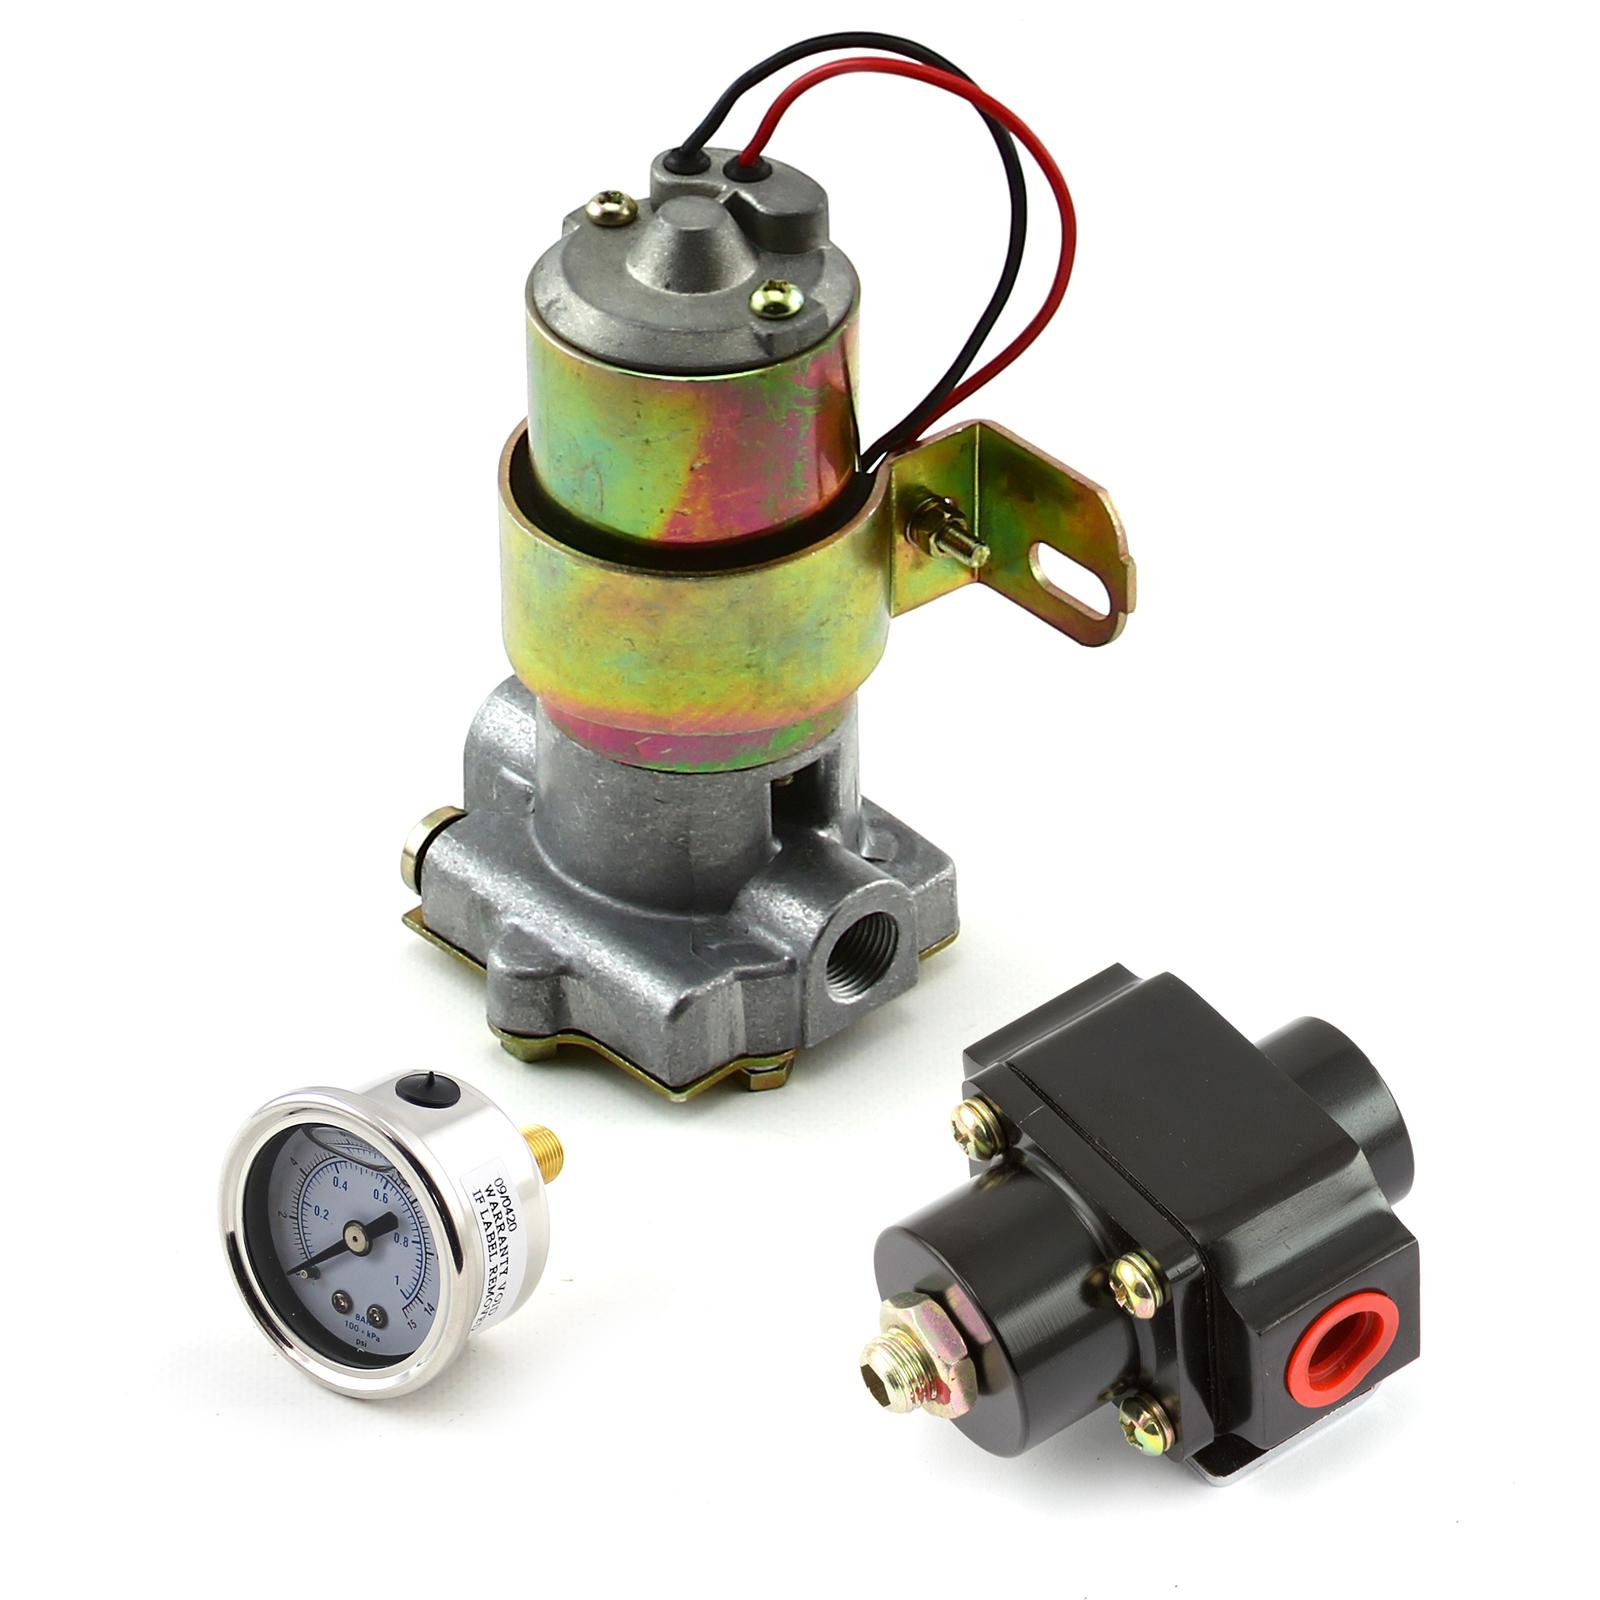 140 Gph Universal Electric Fuel Pump Black Regulator & Gauge Combo Kit